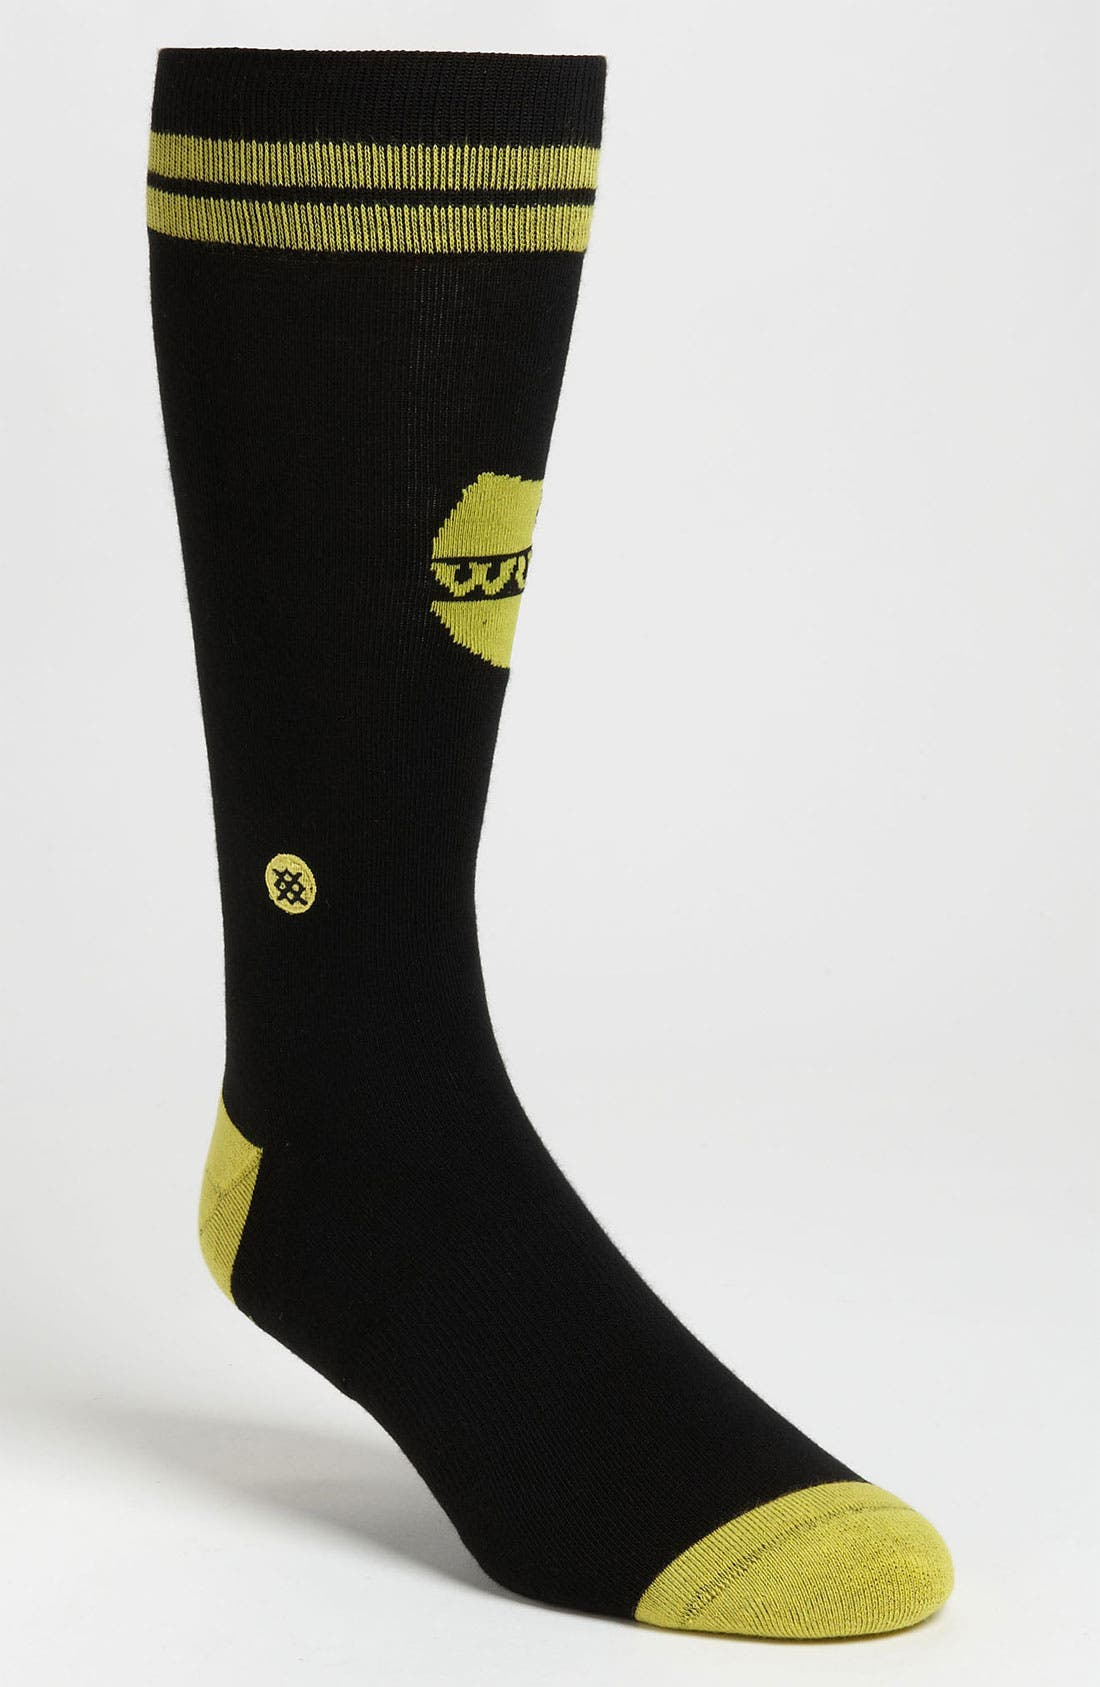 Alternate Image 1 Selected - Stance 'Wu Tang' Socks